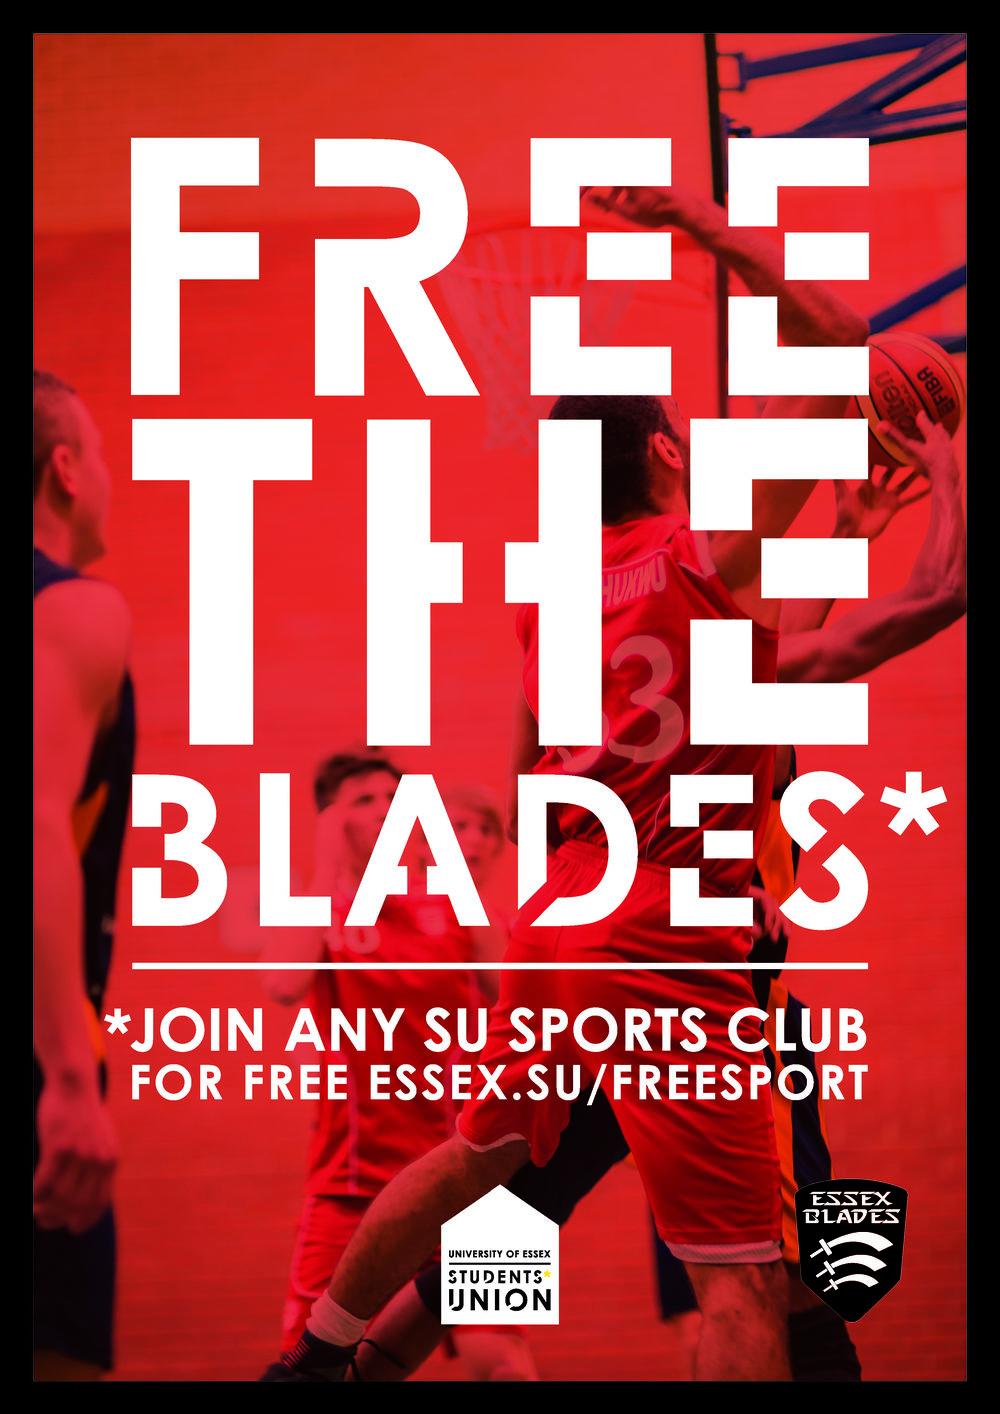 Essex Blades Free Poster v4 [print ready no bleed]_Page_6.jpg